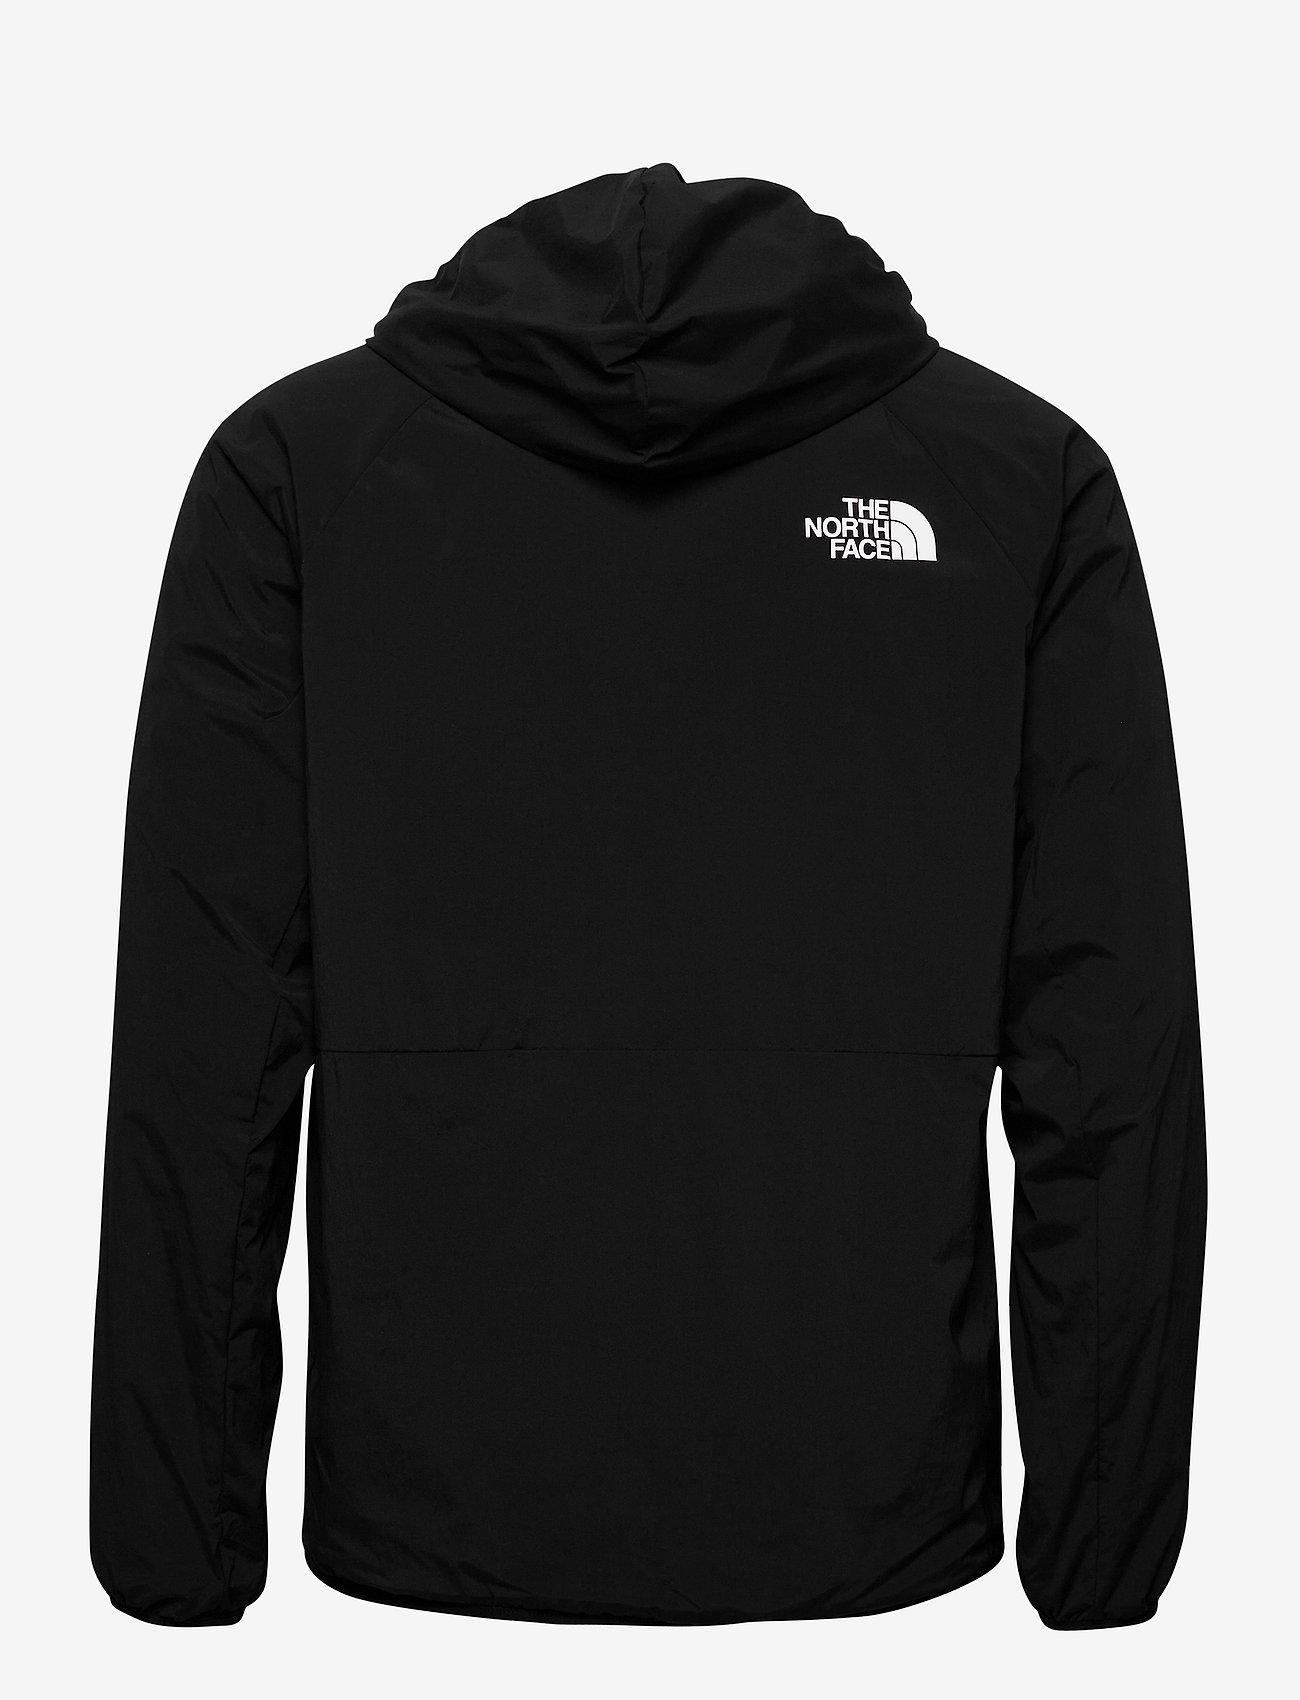 The North Face - M AT INS PO - basic-sweatshirts - tnf black - 1